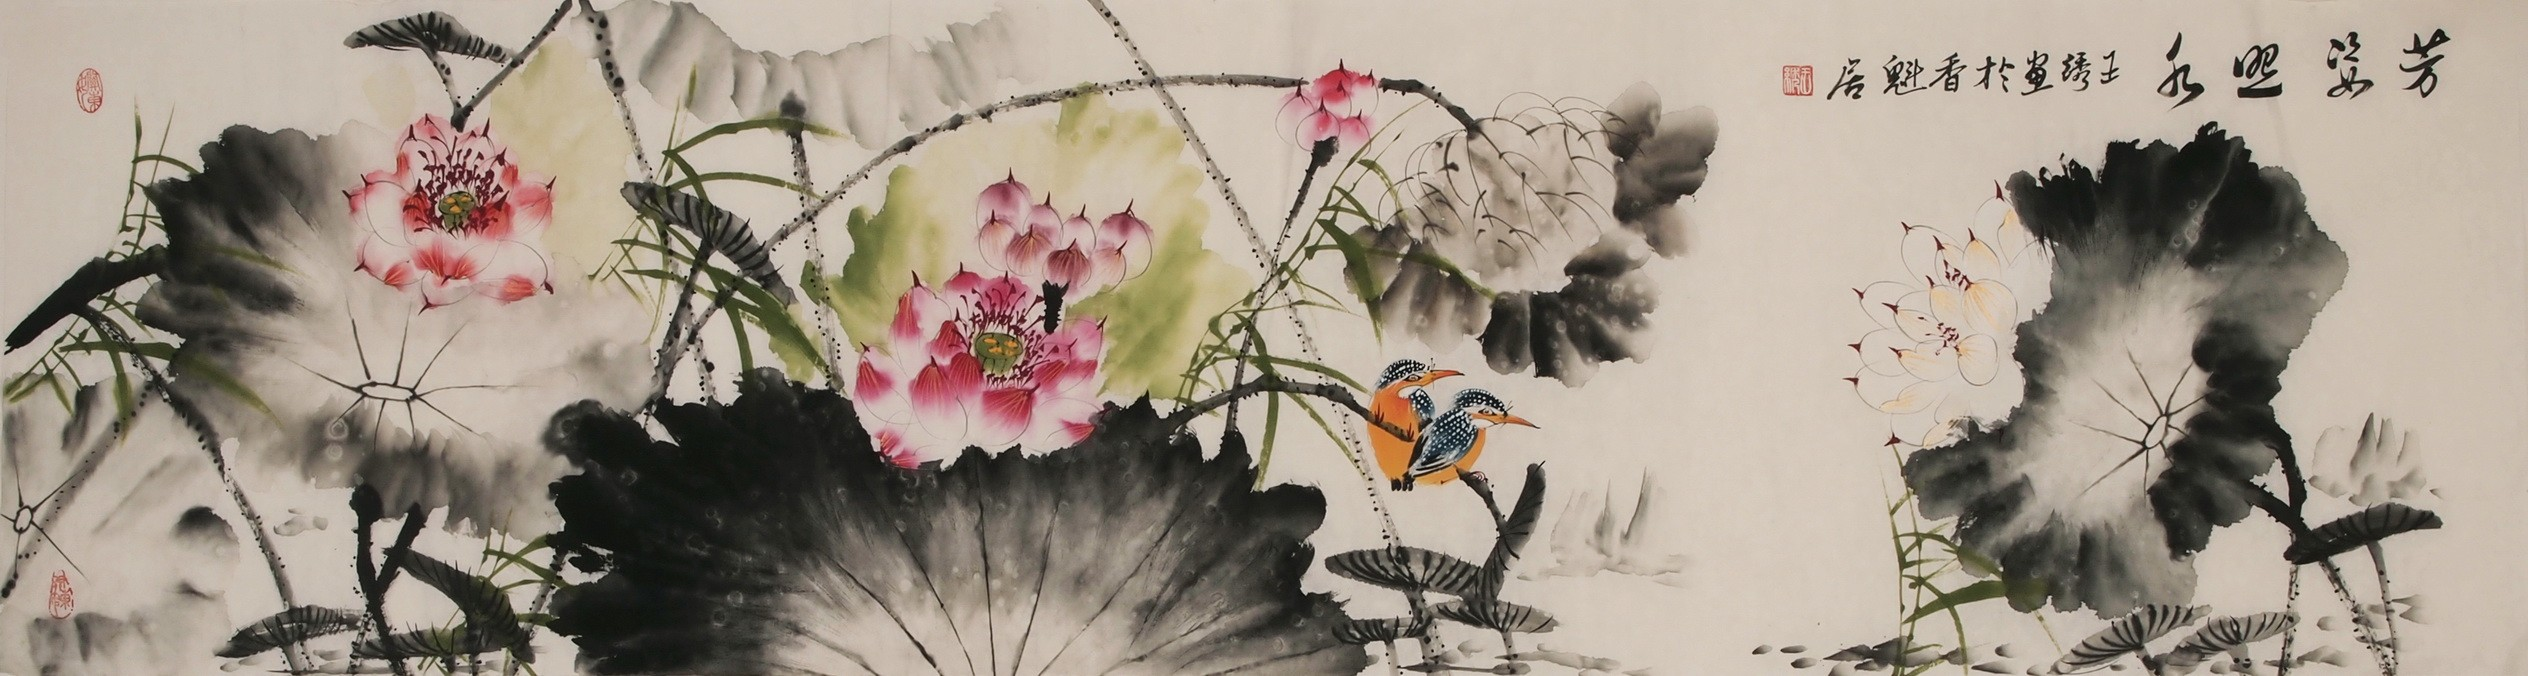 Kingfisher - CNAG004004